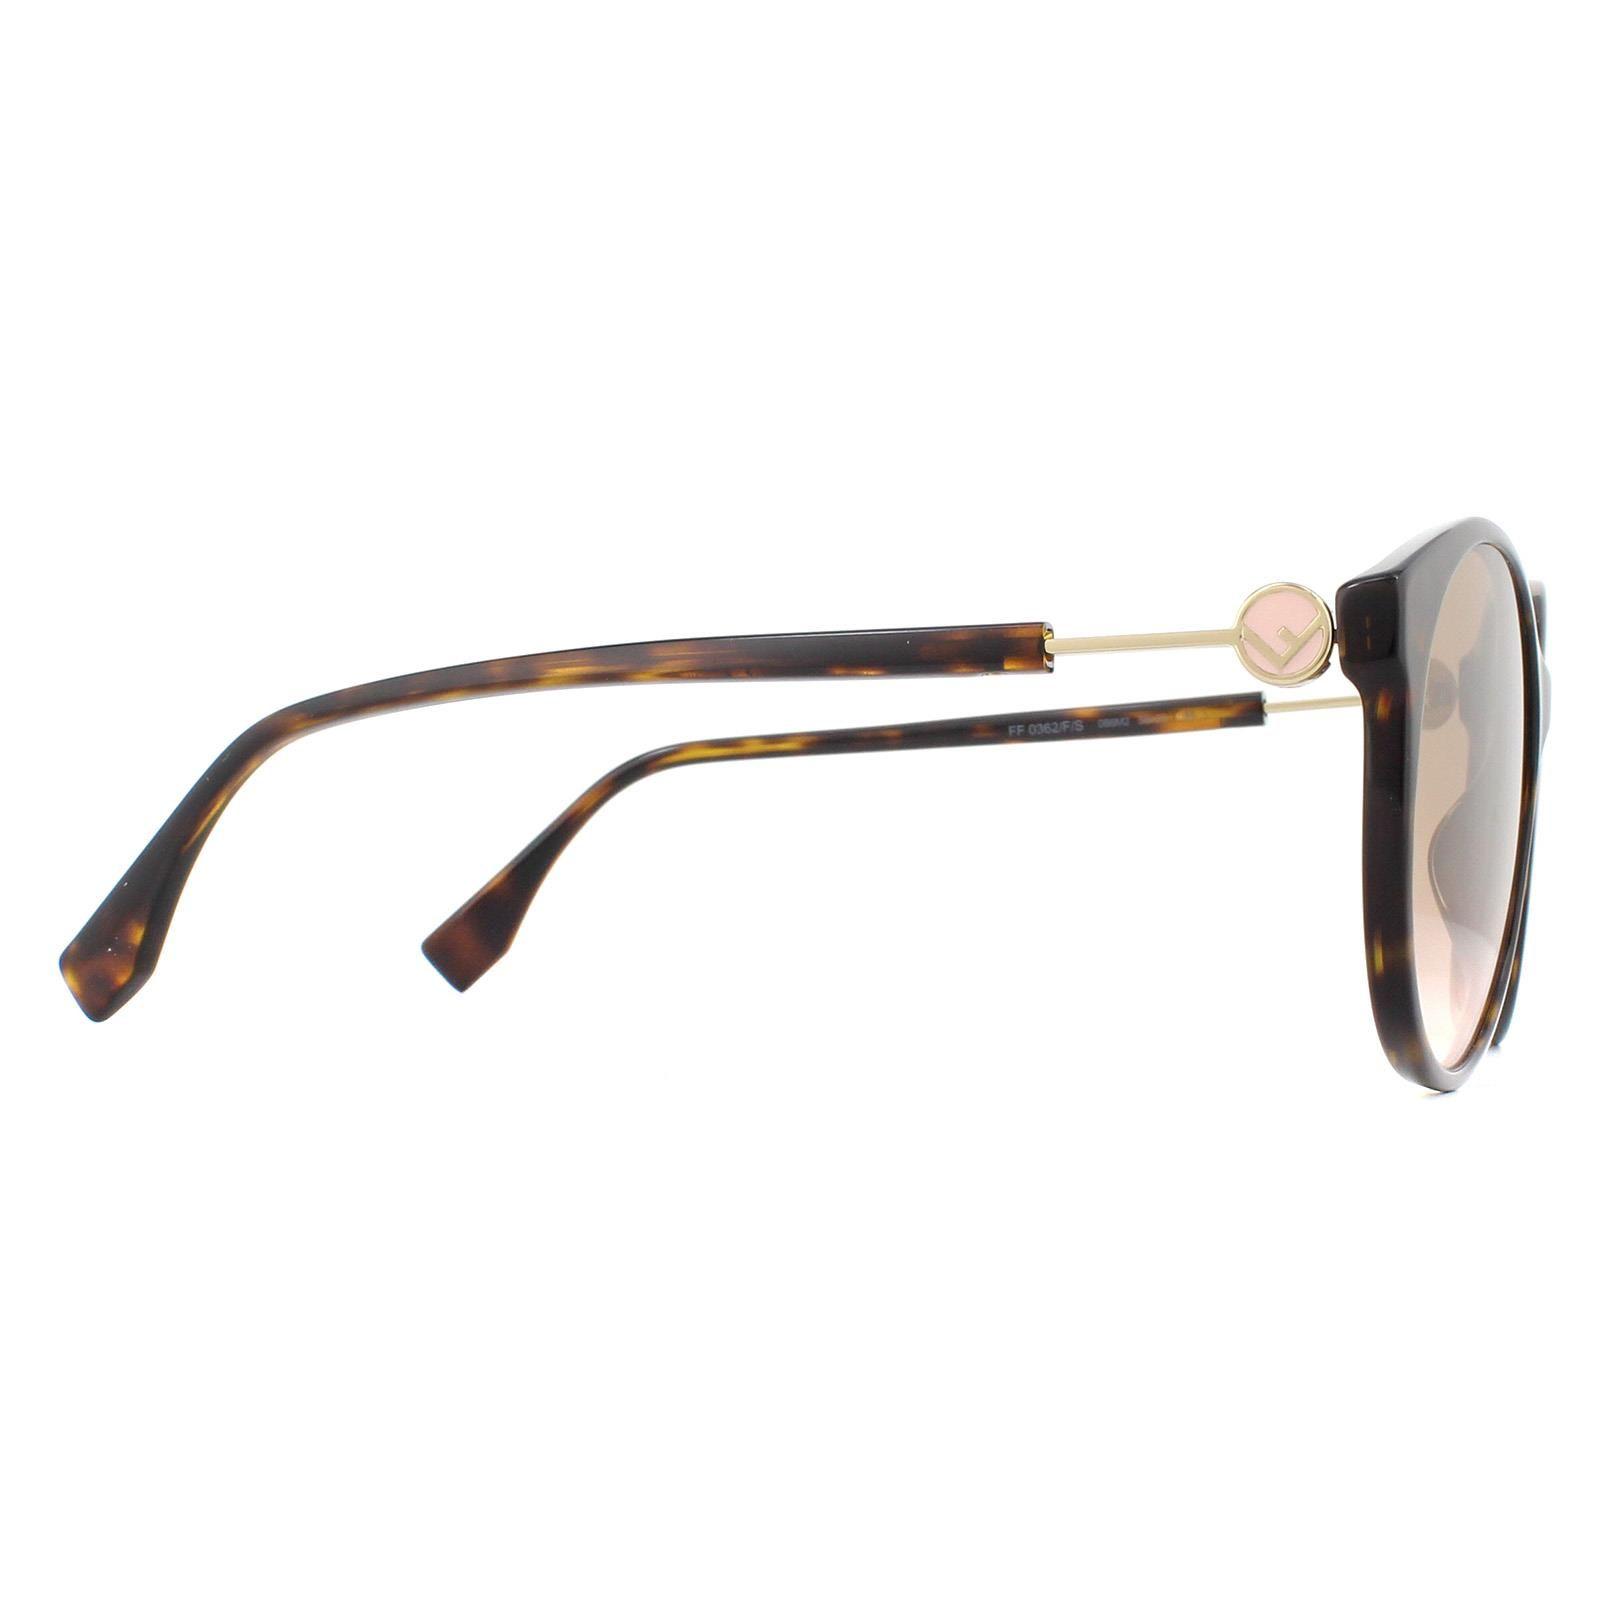 Fendi Sunglasses FF 0362/F/S 086 M2 Dark Havana Brown Gradient